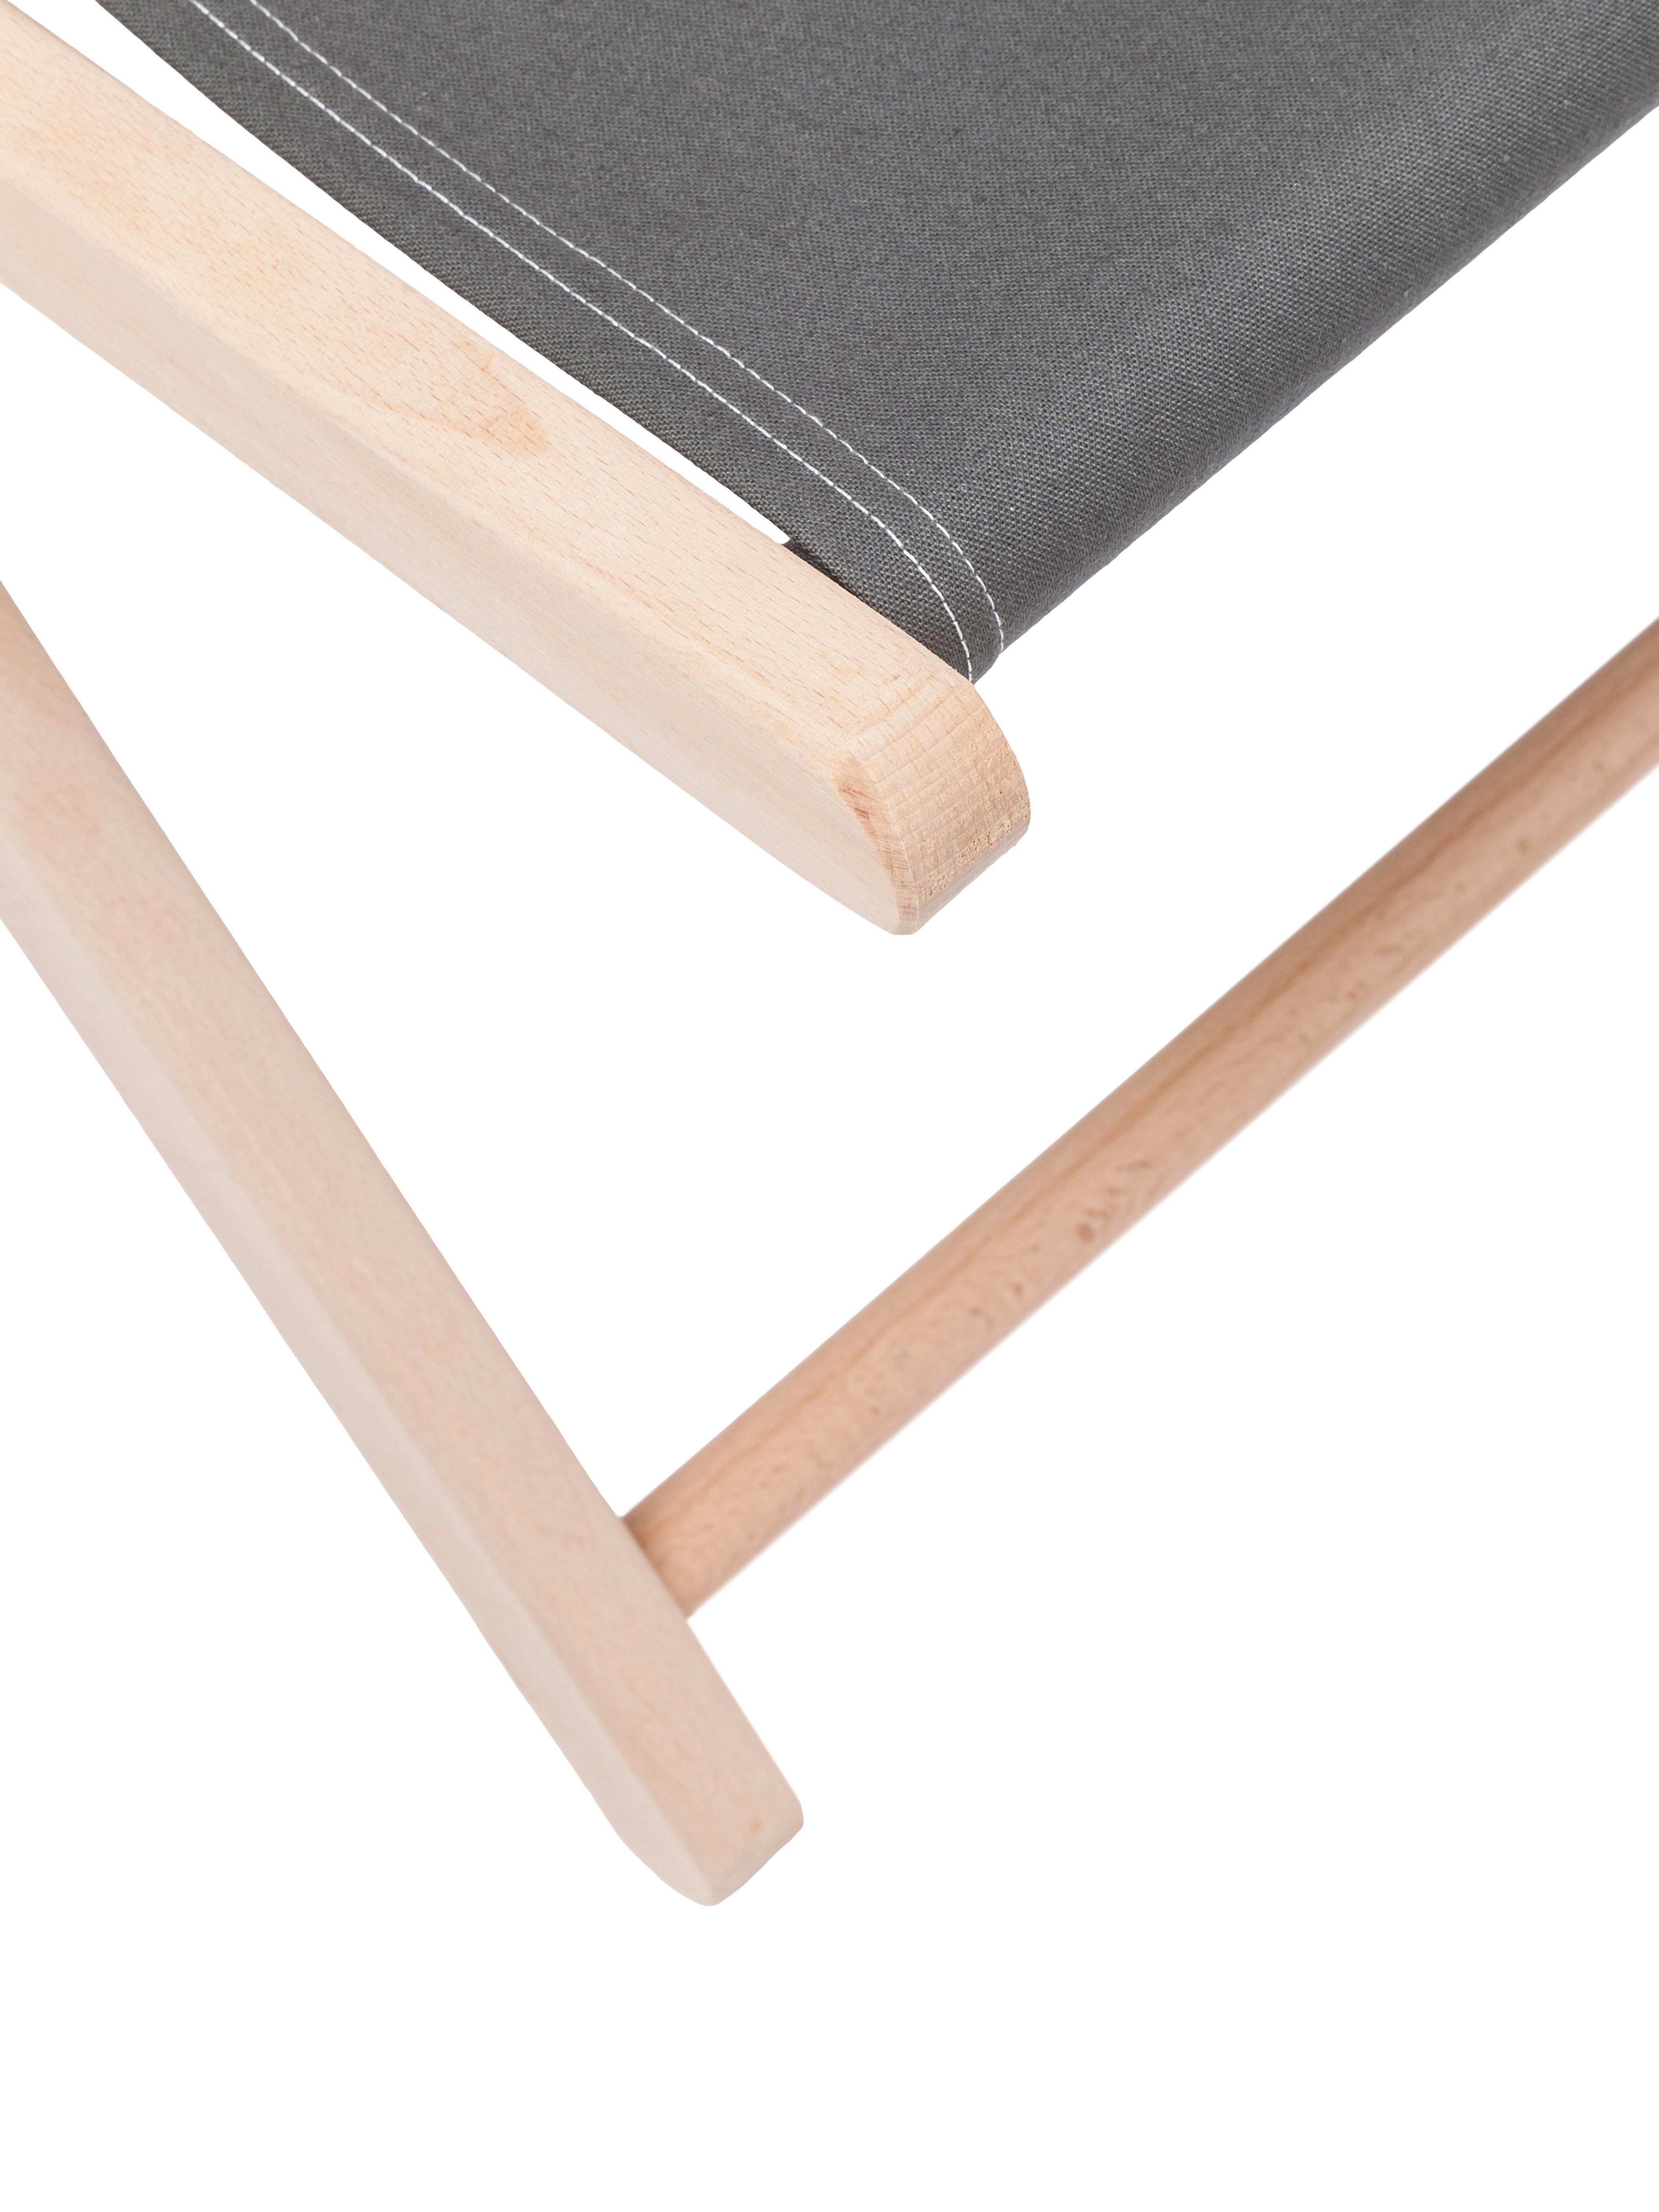 Klapbare ligstoel Hot Summer, Frame: beukenhout, Grijs, beukenhoutkleurig, B 96 x D 56 cm